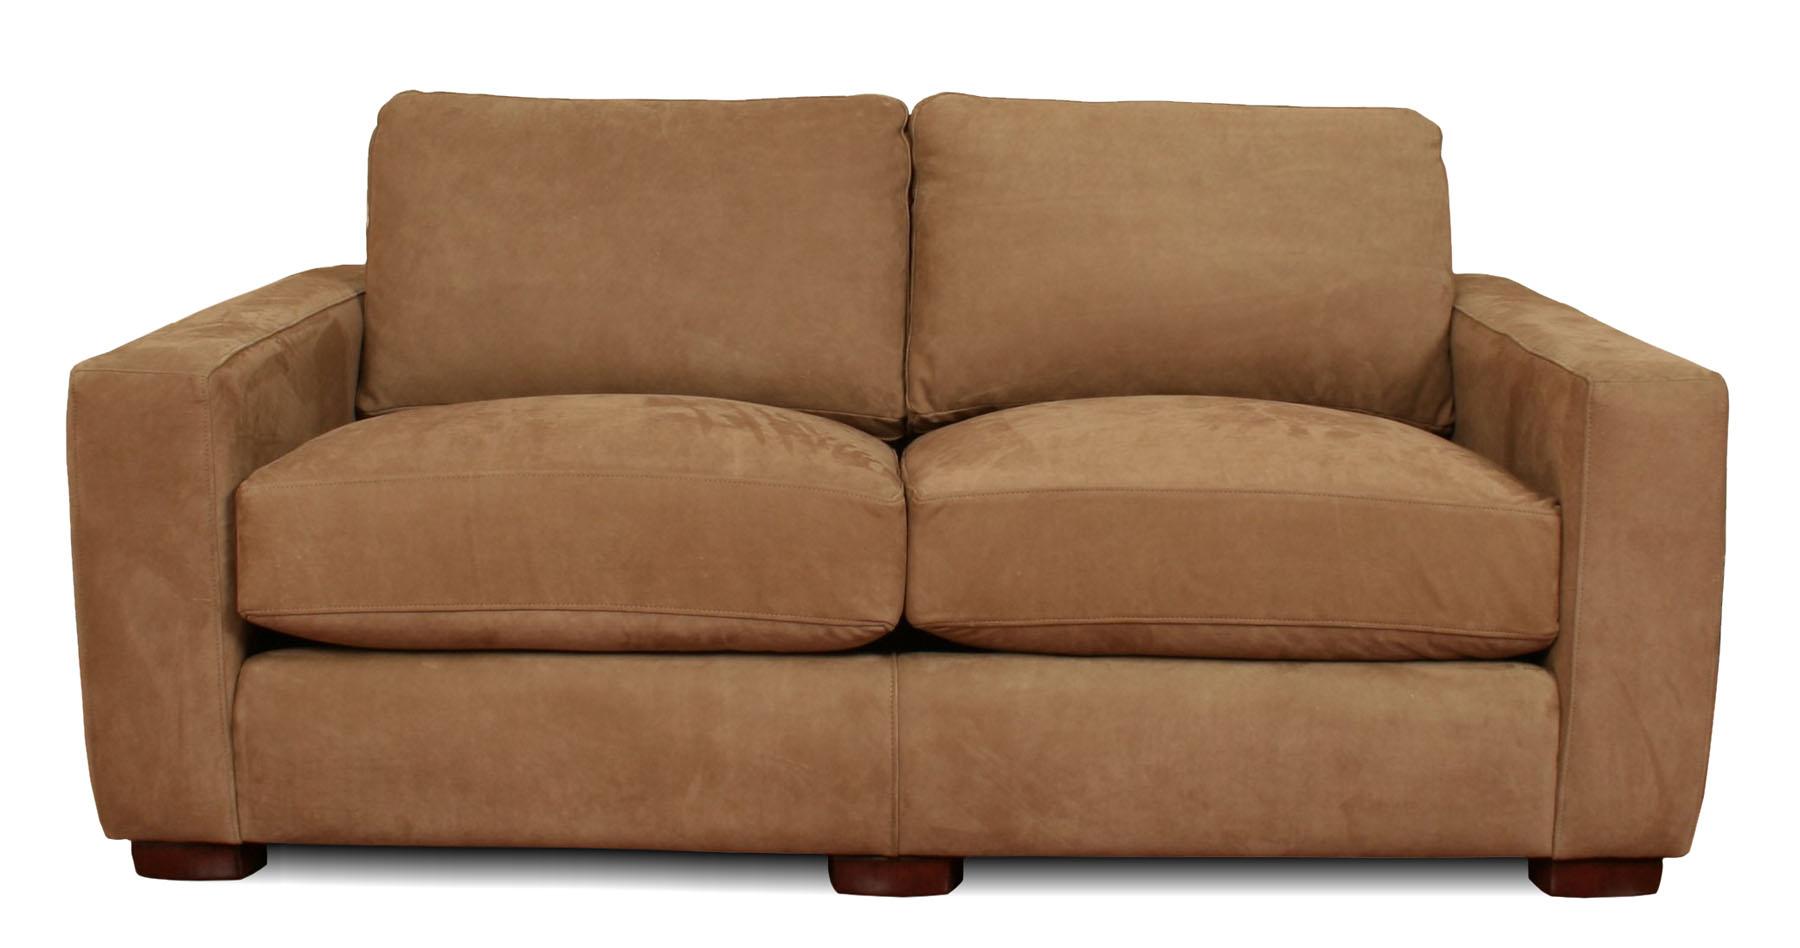 Deep leather sofa living room incredible legend deep Deep sectional sofa